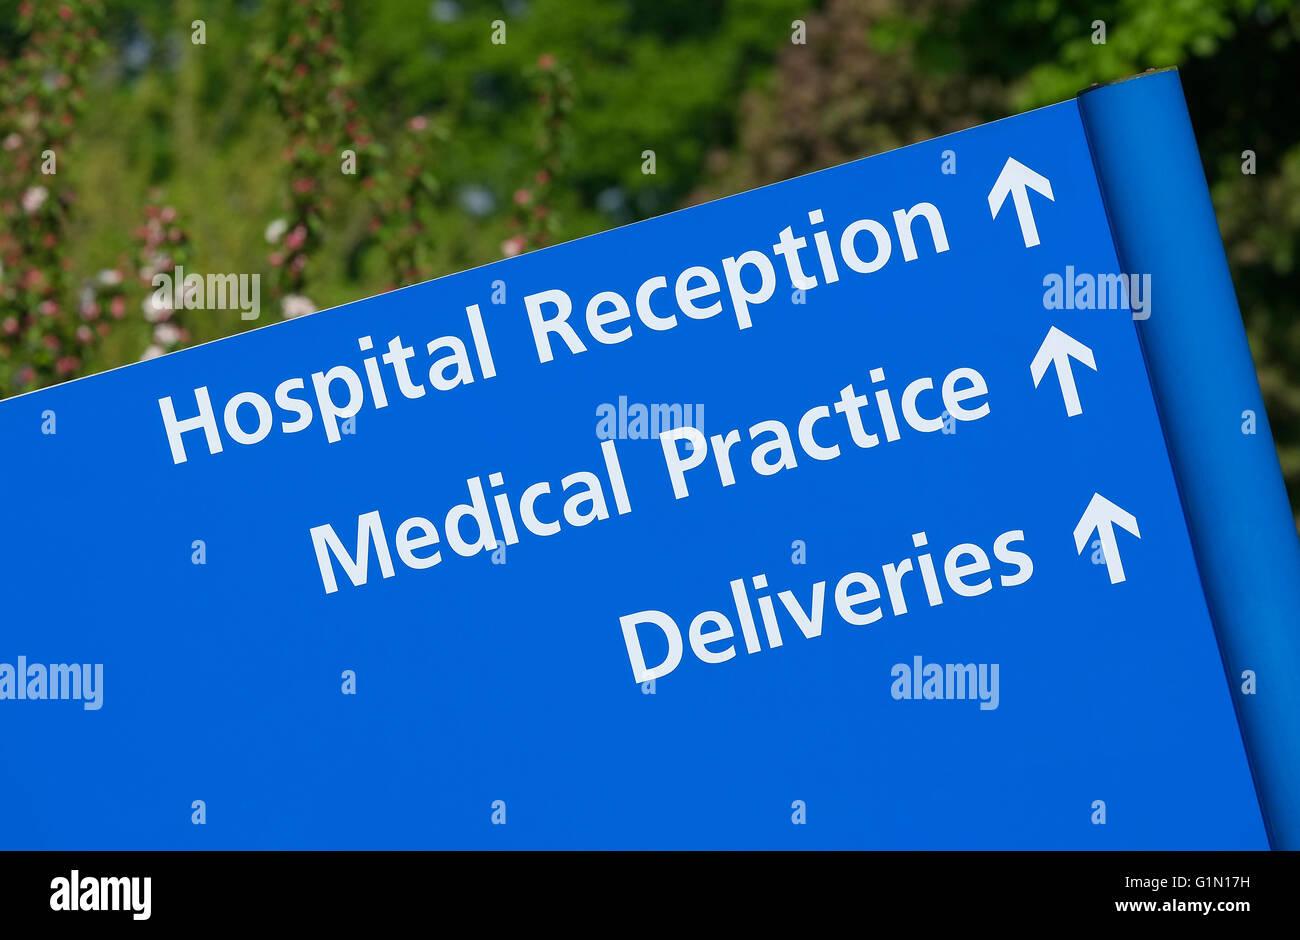 hospital reception board - Stock Image